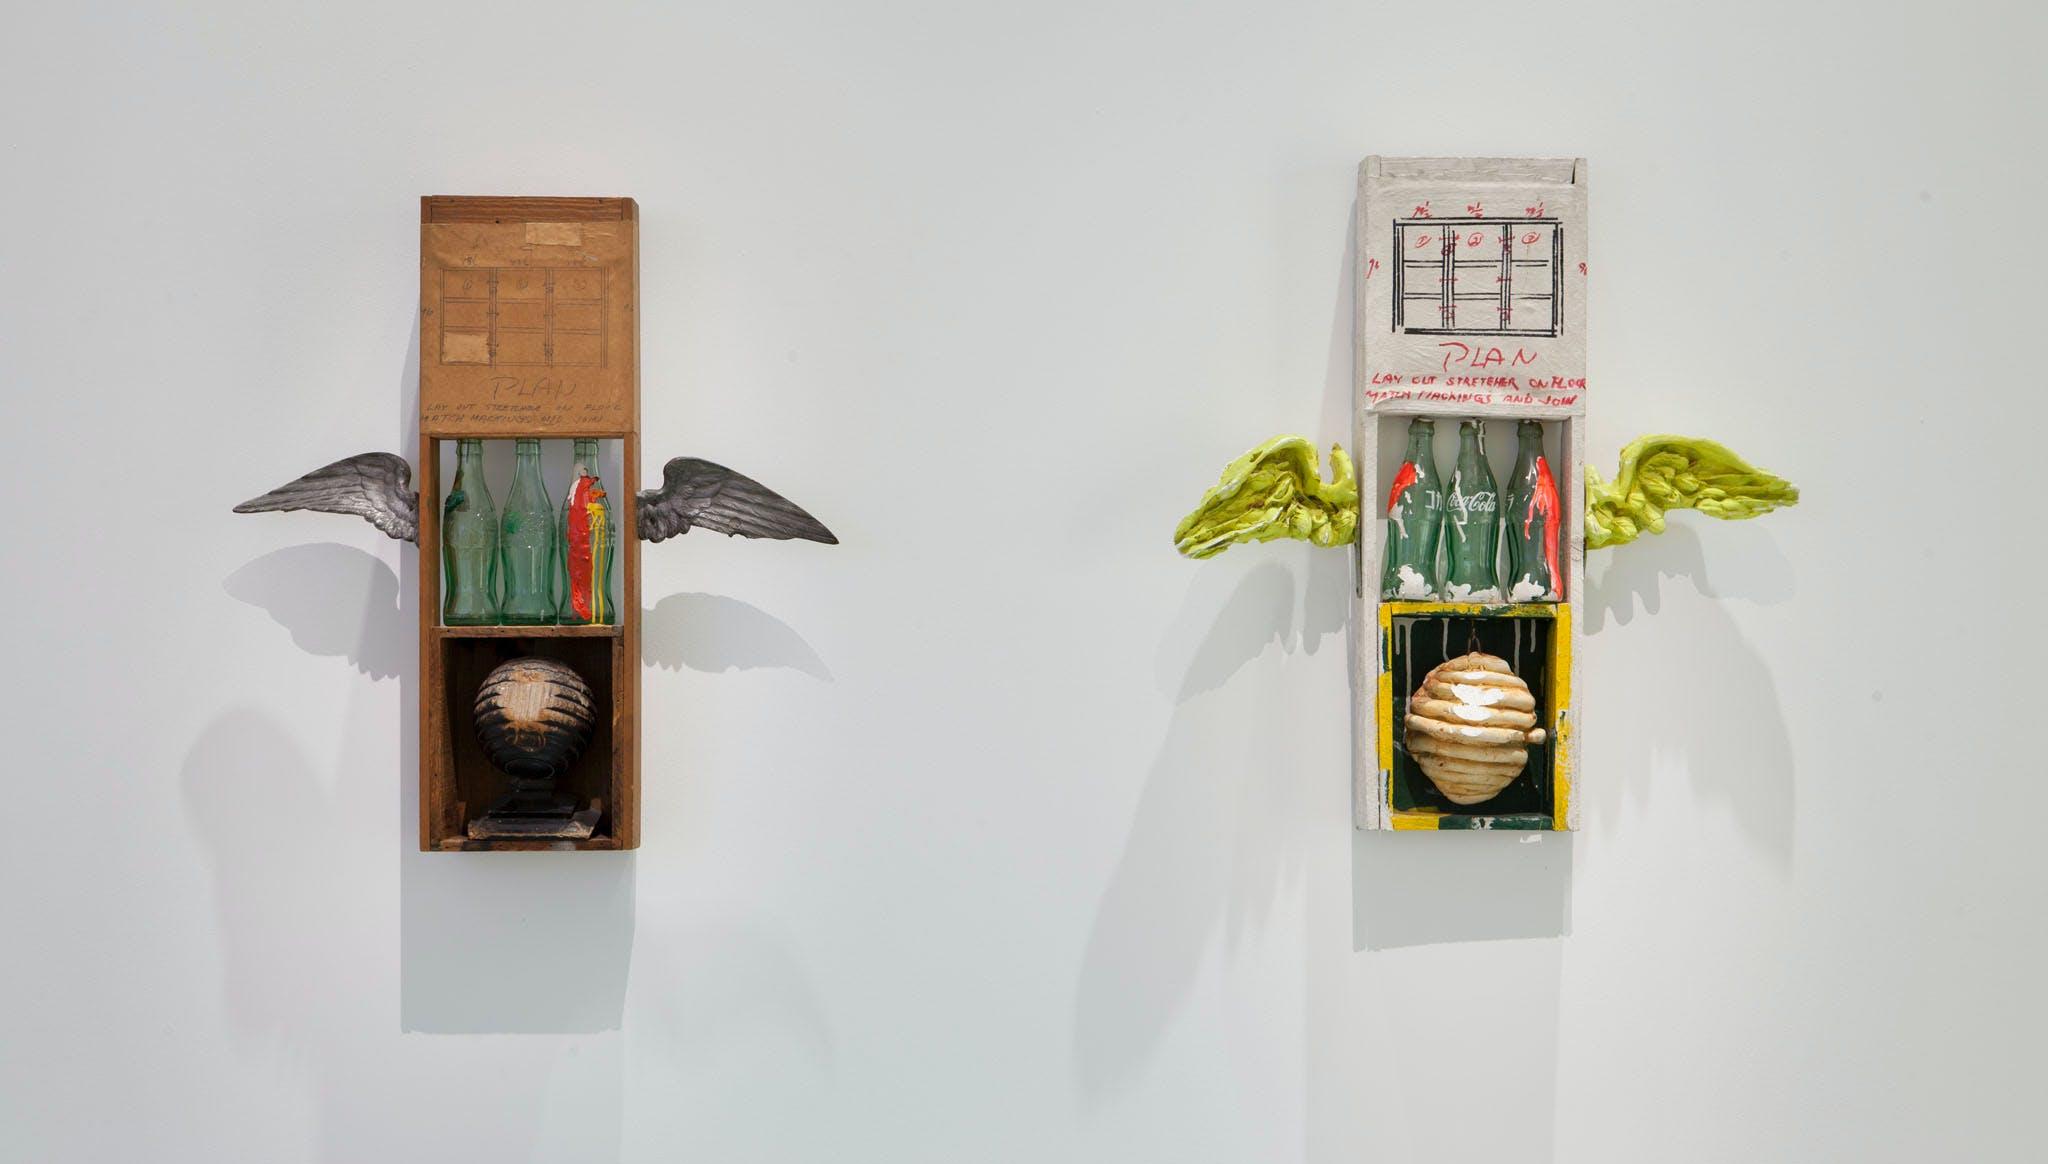 View of the exhibition International Pop, 2015; (left to right): Robert Rauschenberg, Coca-Cola Plan, 1958; Shinohara Ushio, Coca-Cola Plan, 1964